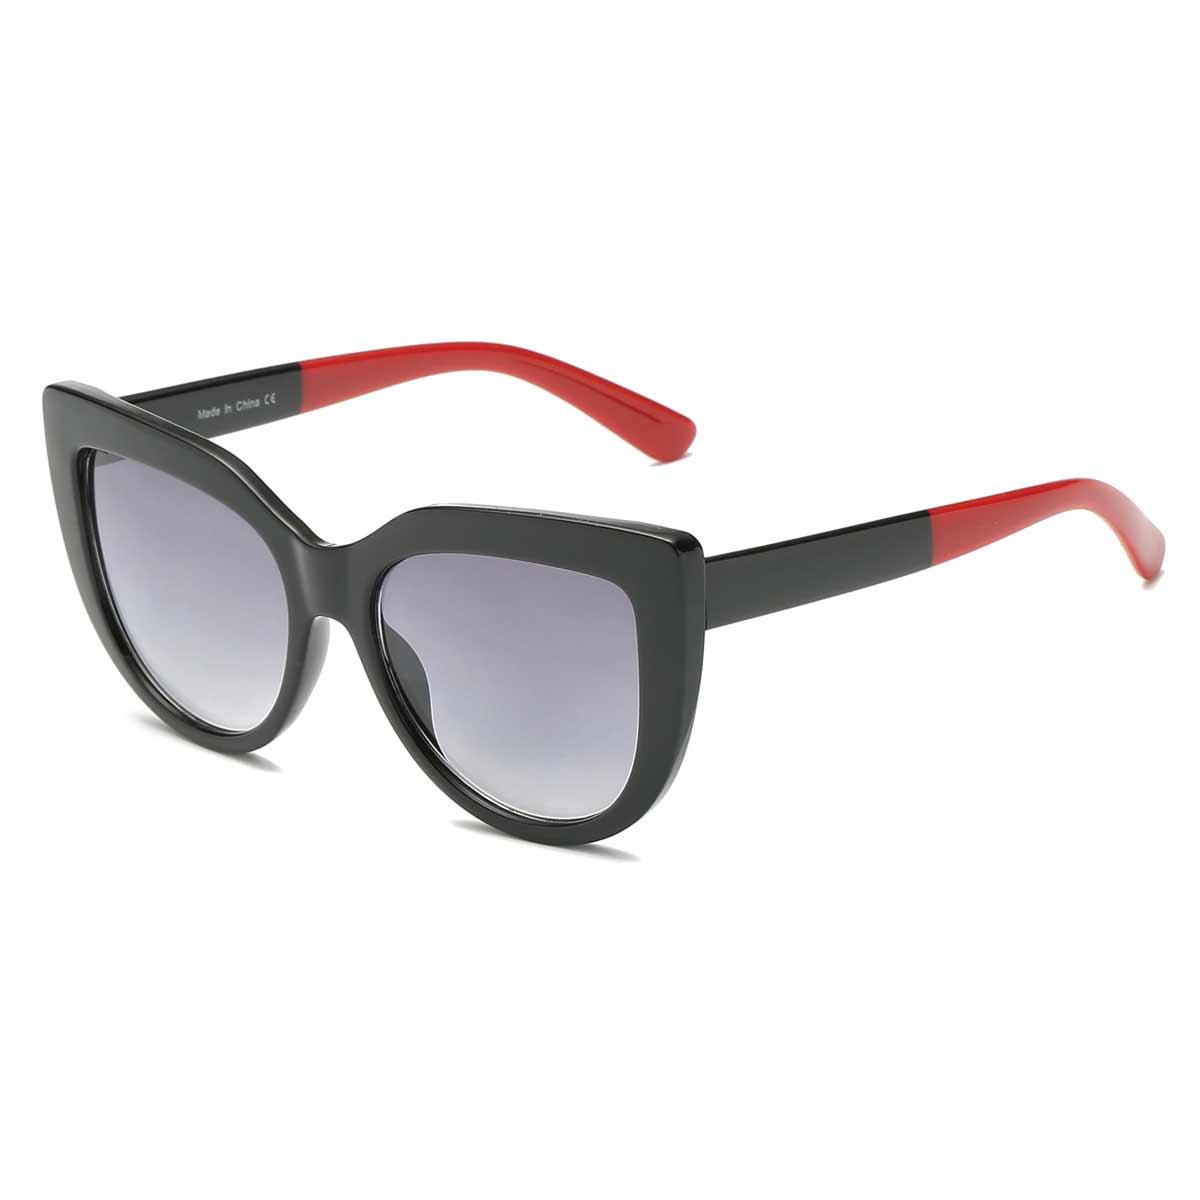 Black and Red Retro Sunglasses